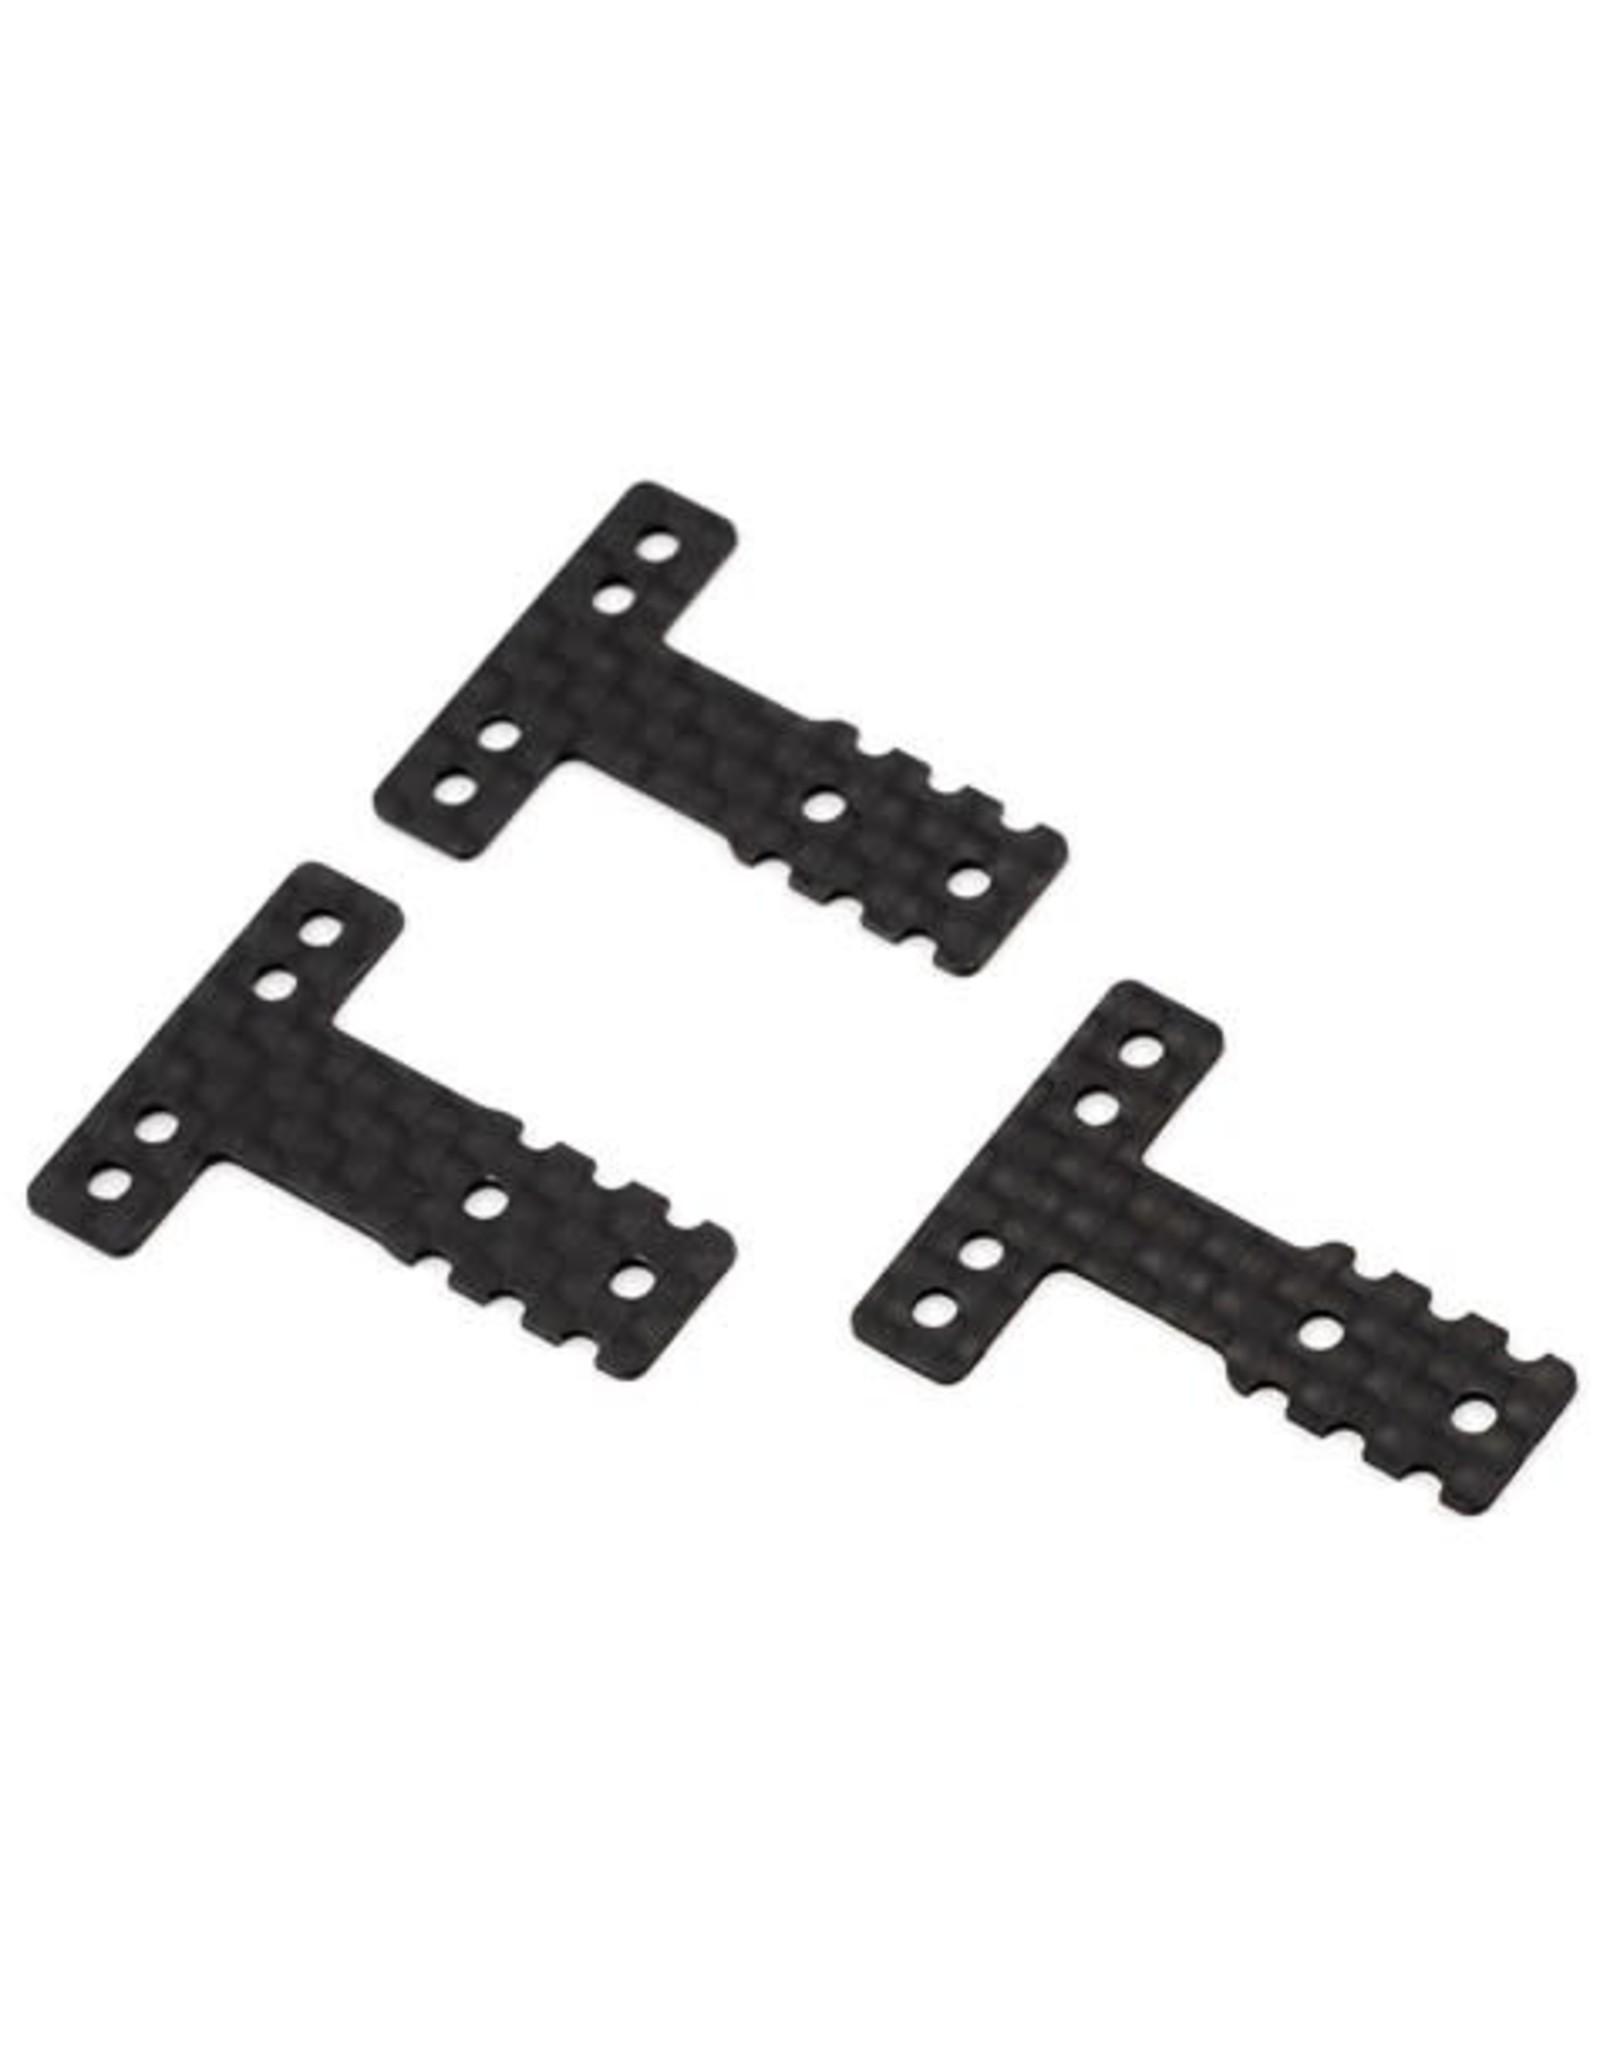 Kyosho Mini Z Suspension Small Parts set